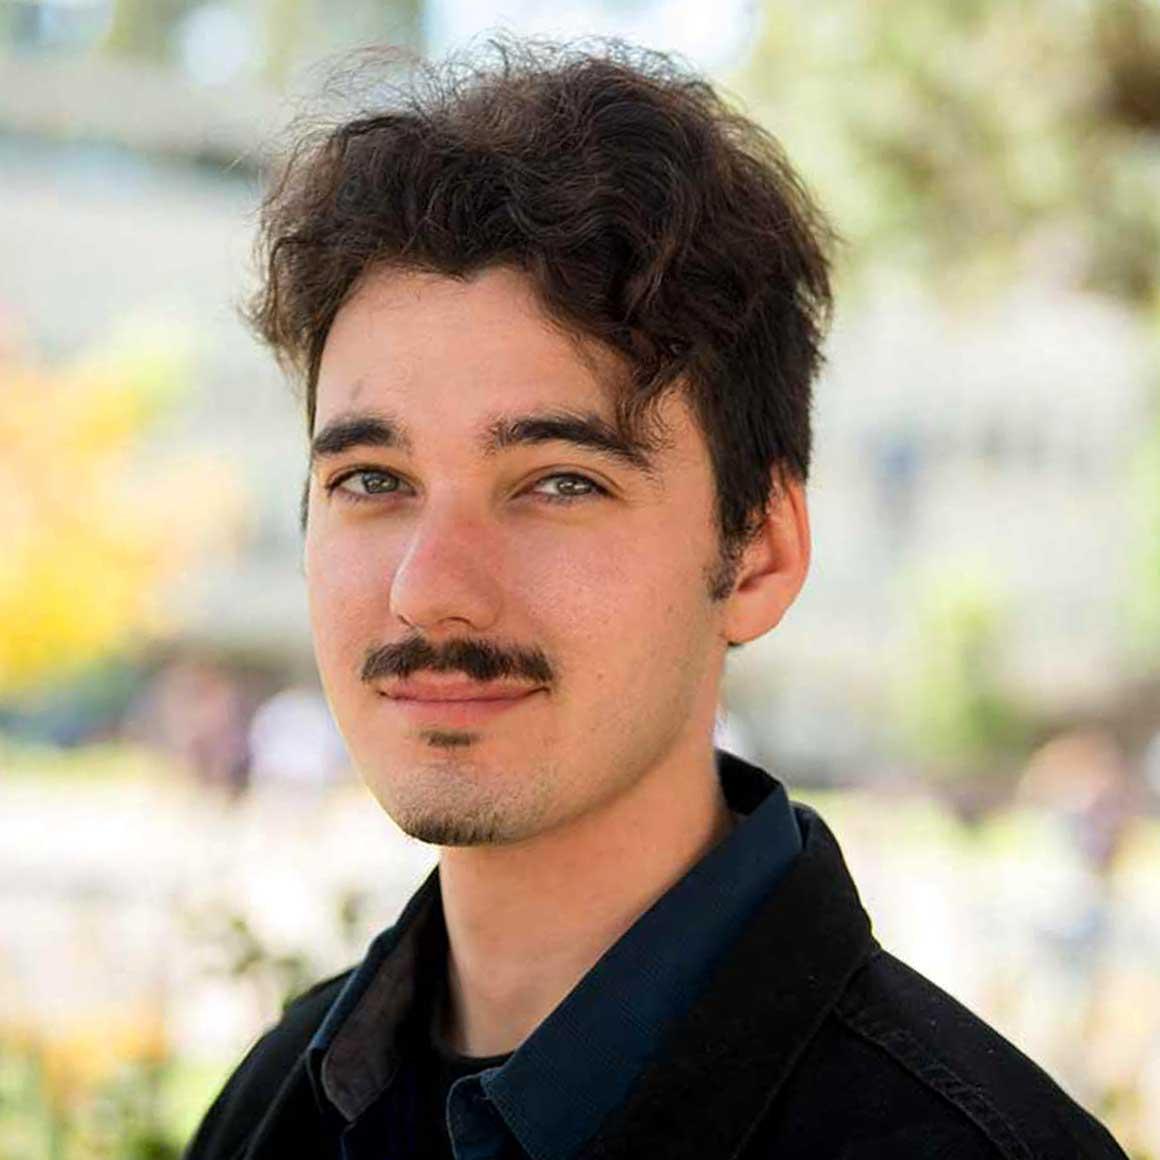 Ricky Flahive